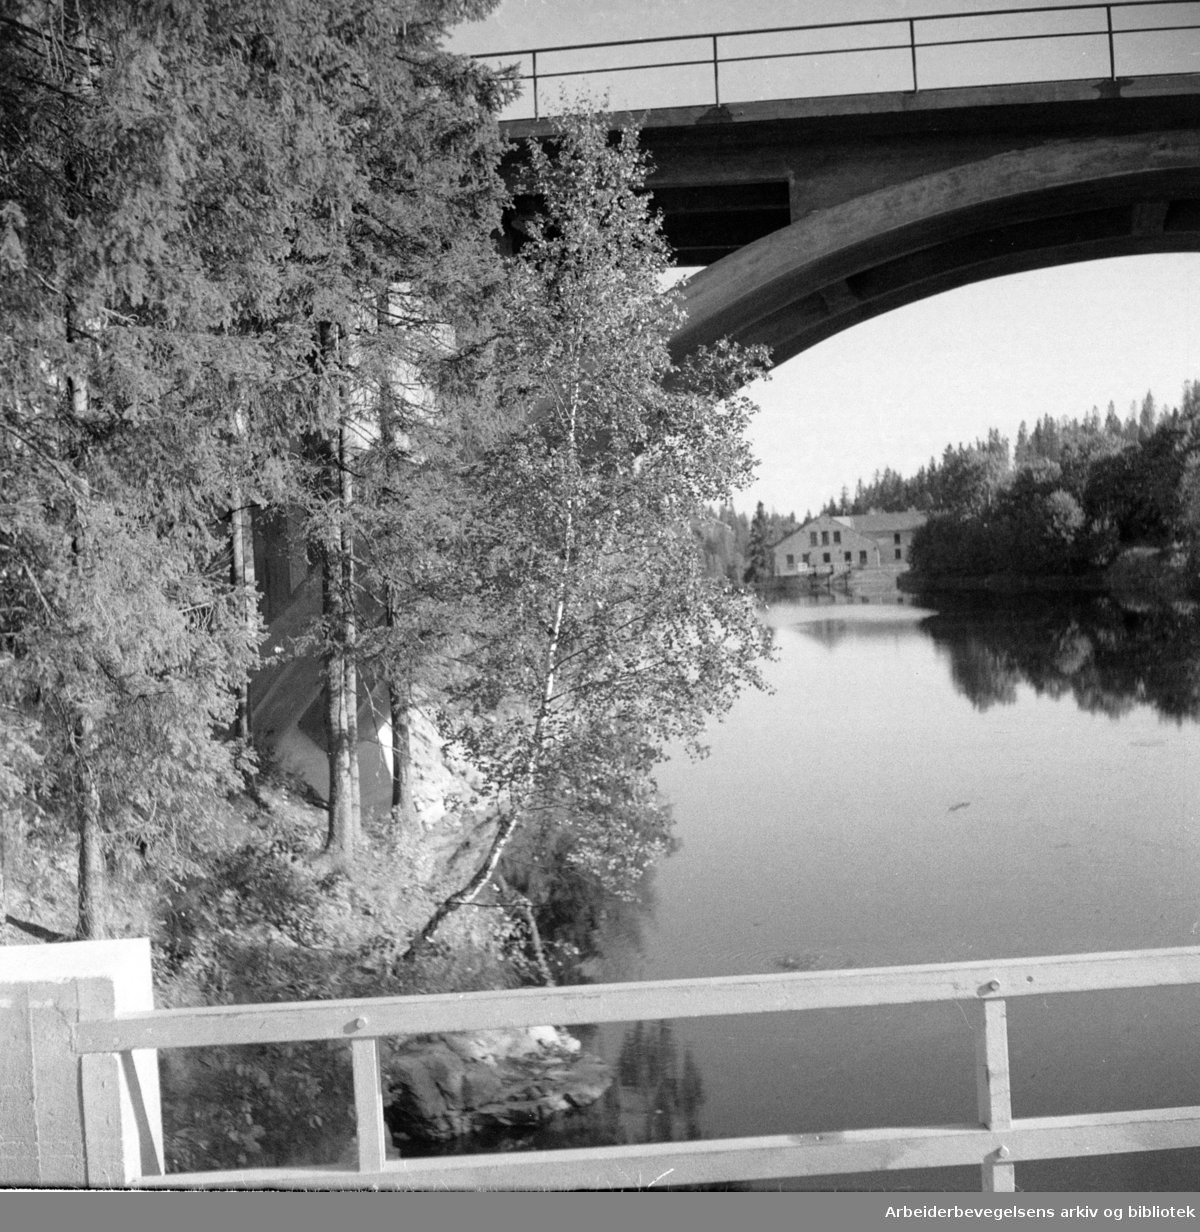 Røa. Røabanens bru over Lysakerelva. Juli 1948